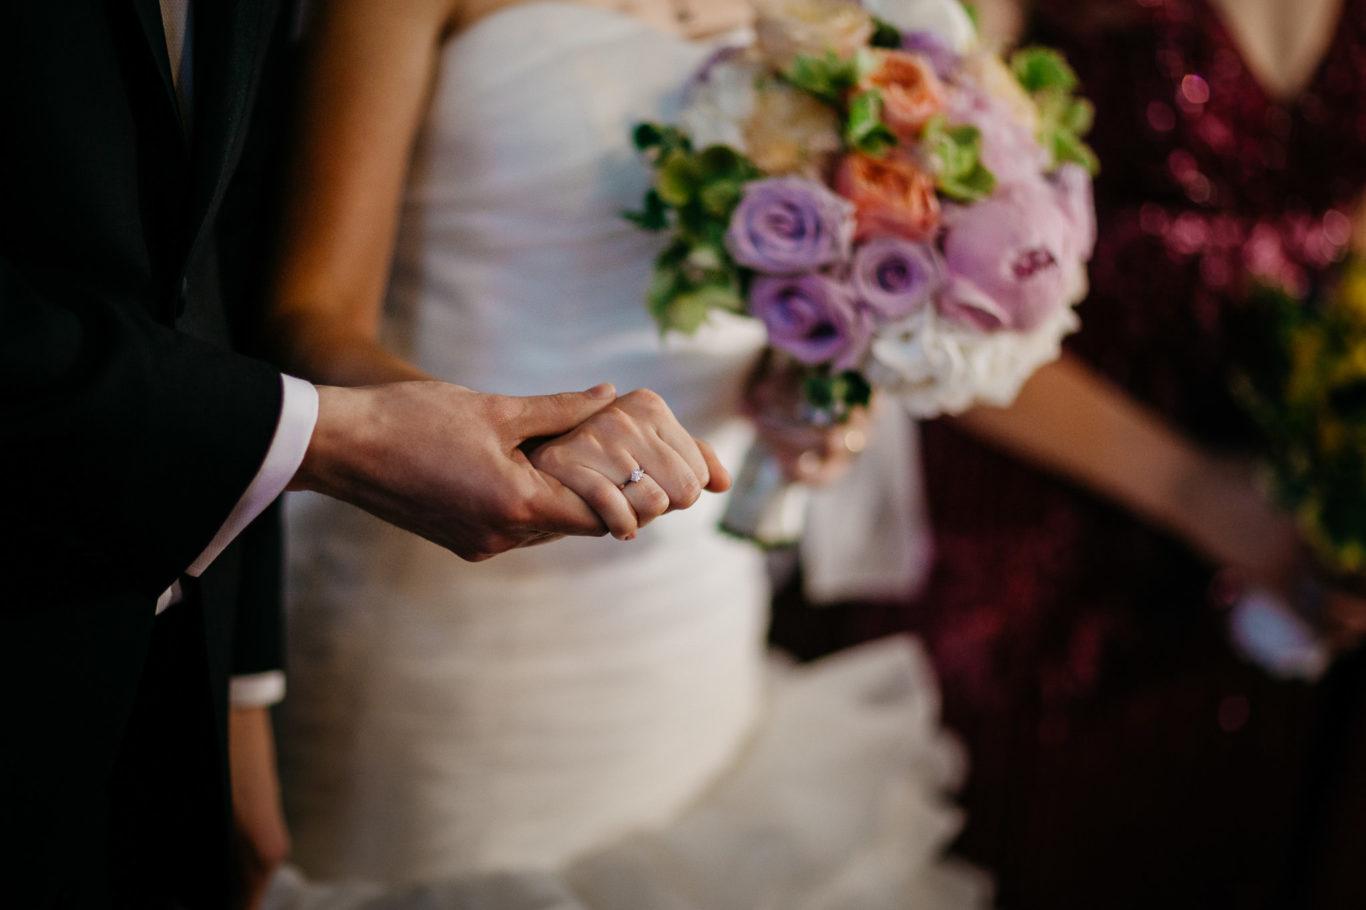 0441-Fotografie-nunta-Simona-Valentin-fotograf-Ciprian-Dumitrescu-CDF_9265